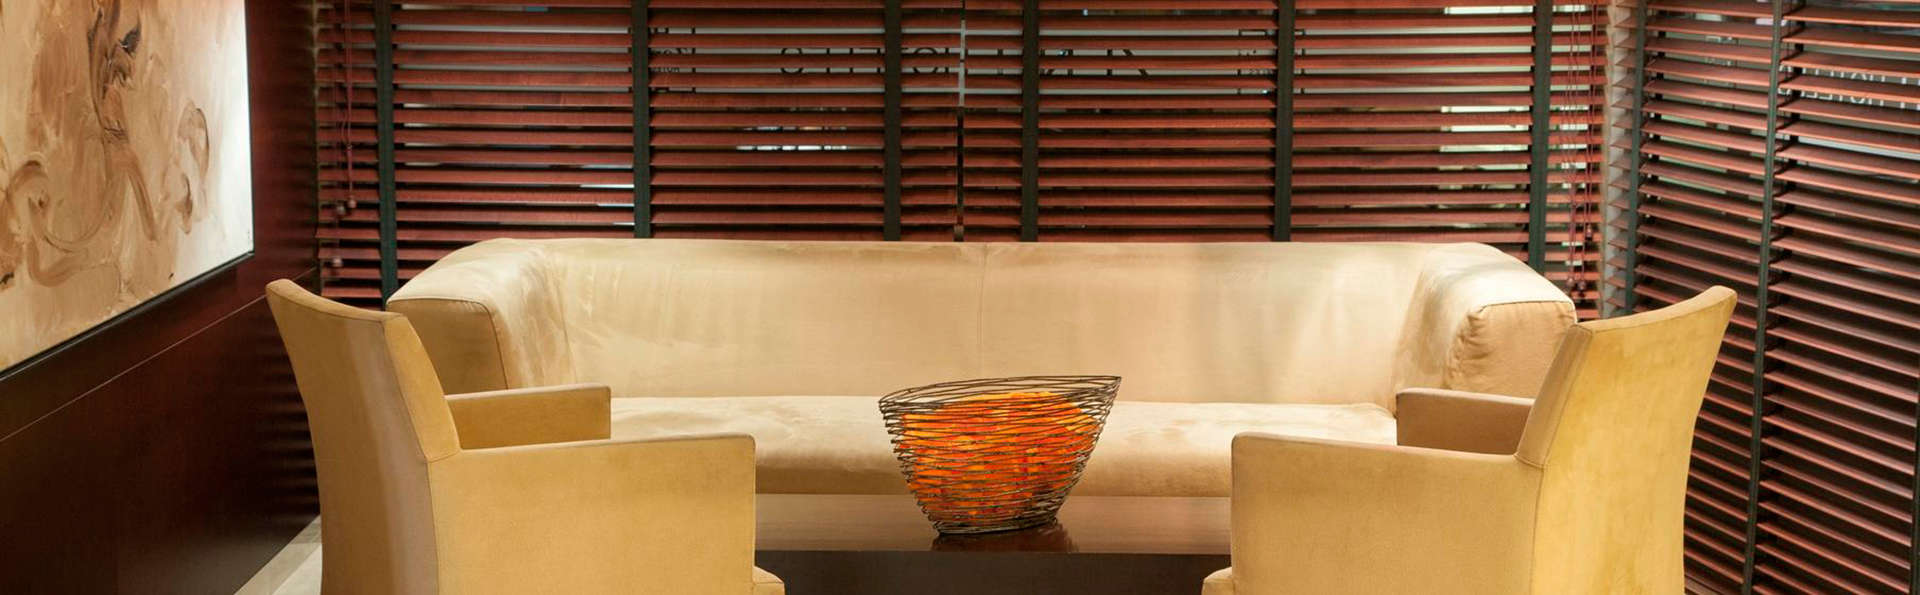 Hotel Zenit Lleida - EDIT_lobby1.jpg